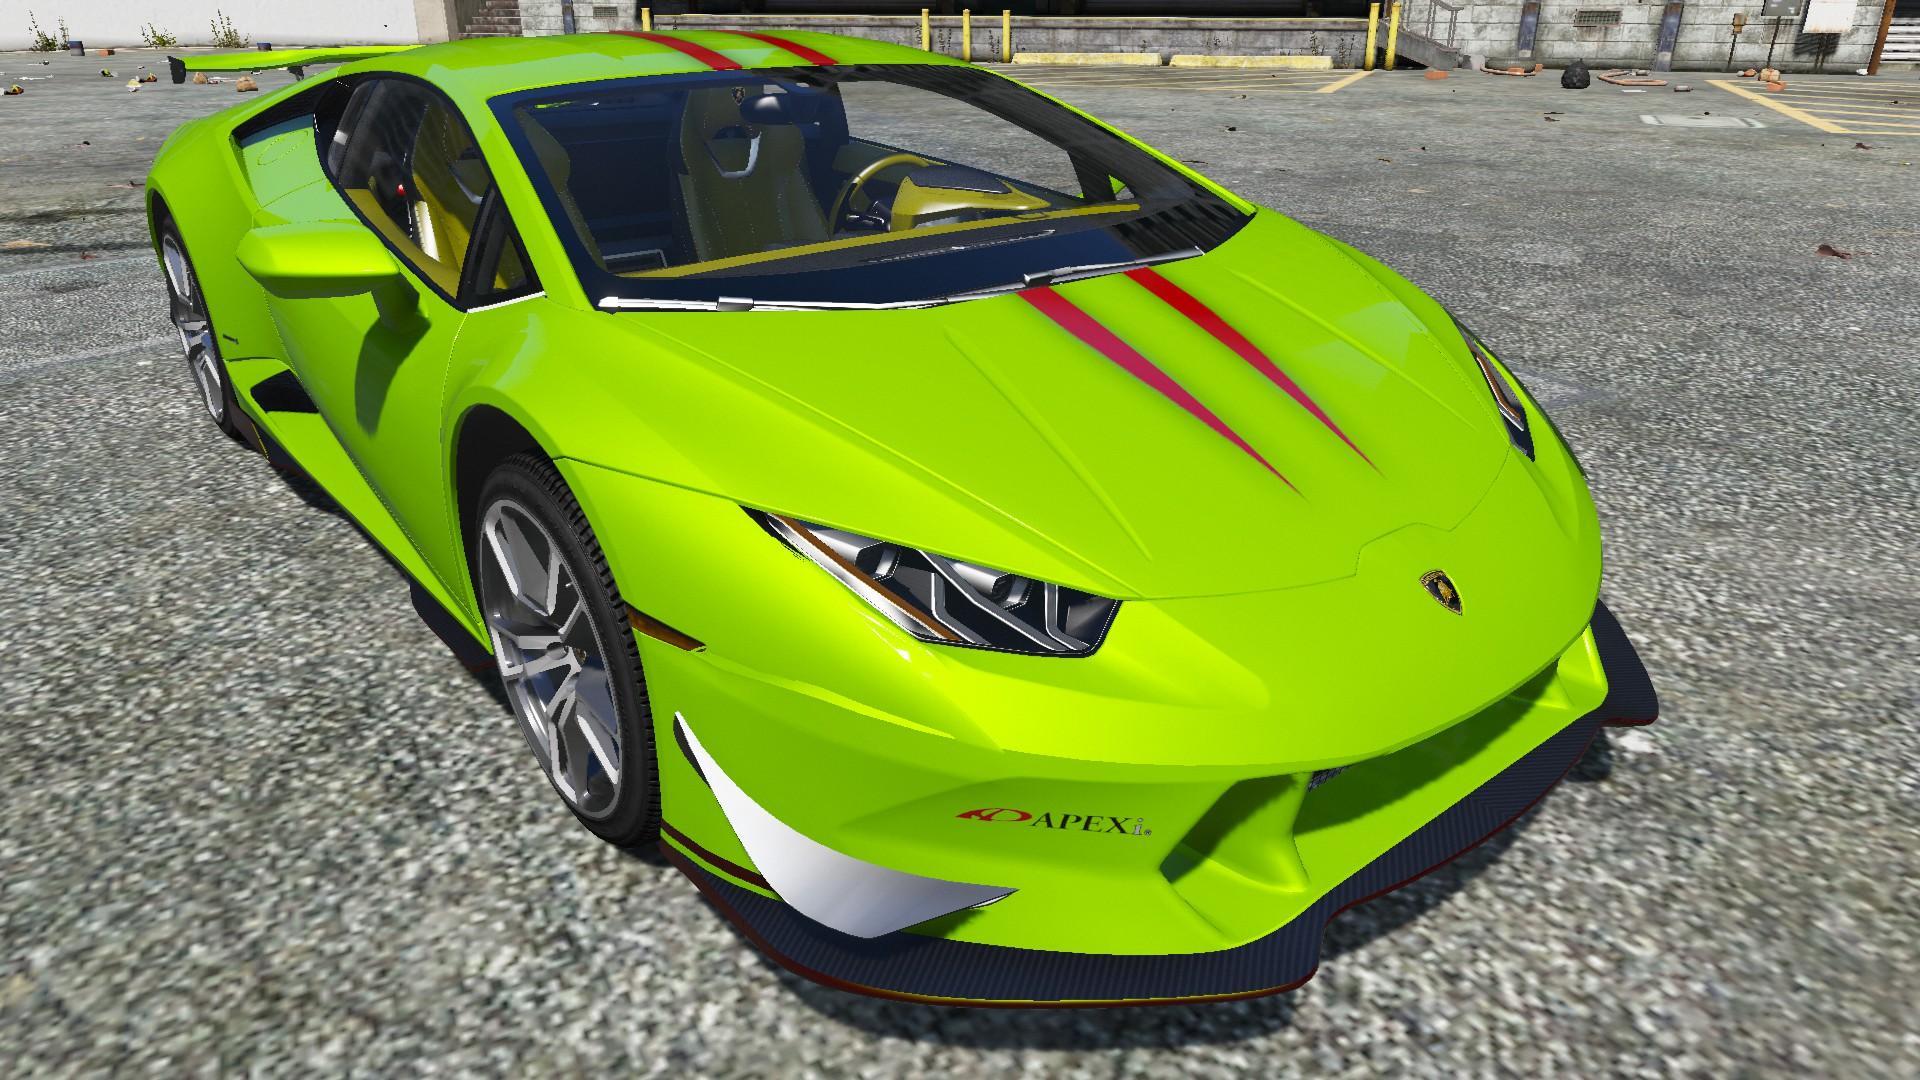 2015 Lamborghini Huracan Lp 610 4 Gta5 Mods Com